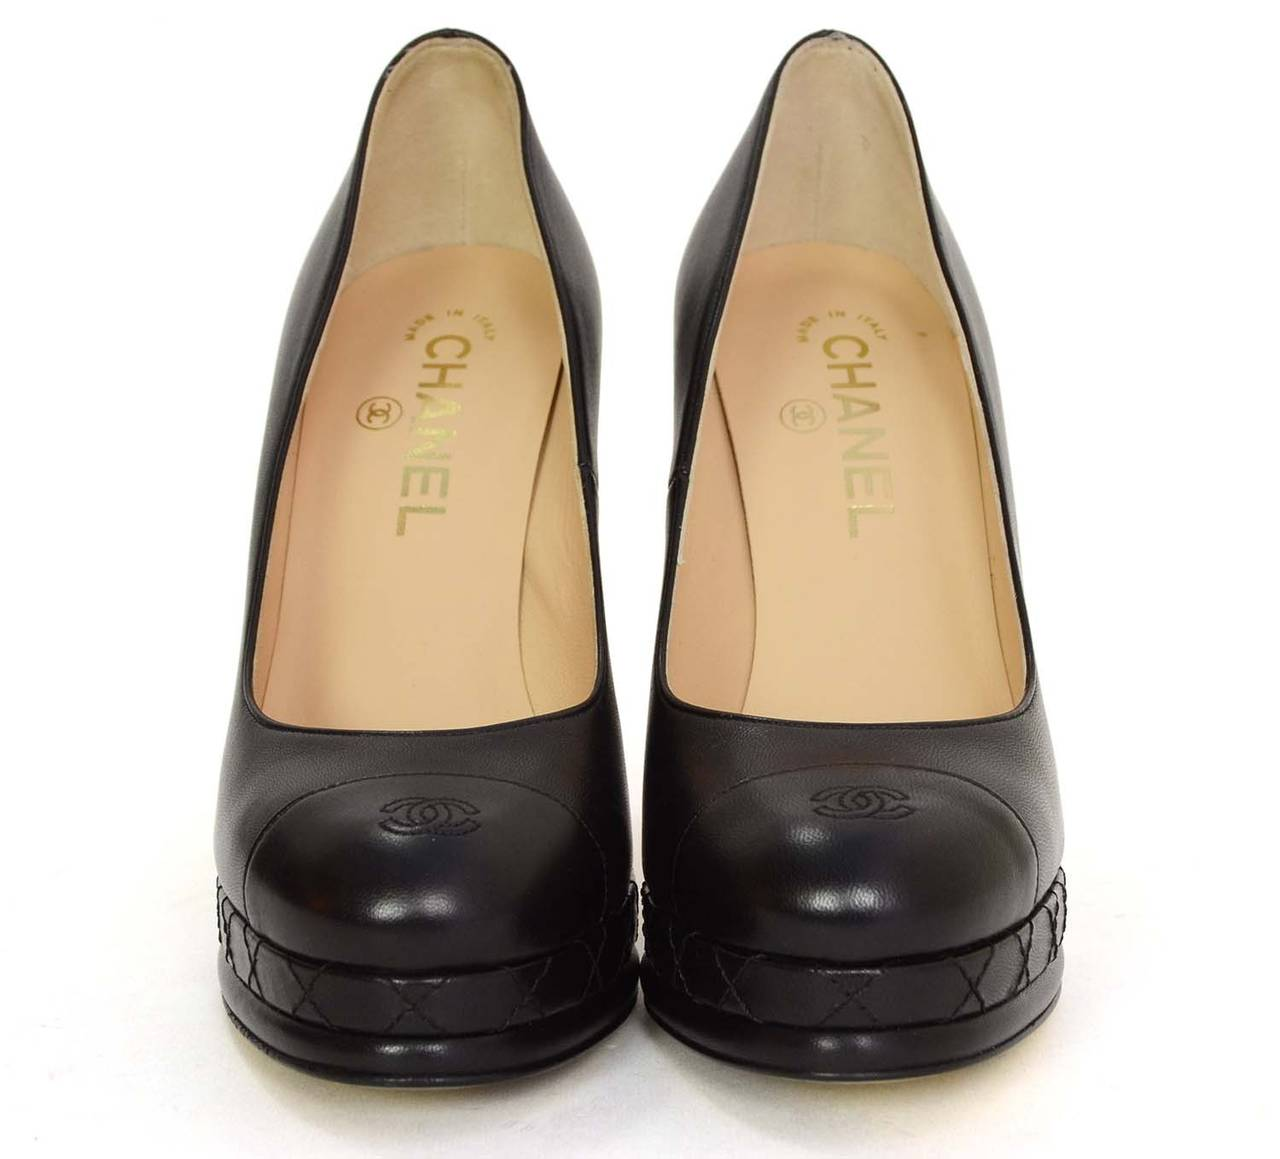 CHANEL Black Leather Round Toe Pumps sz 37 2